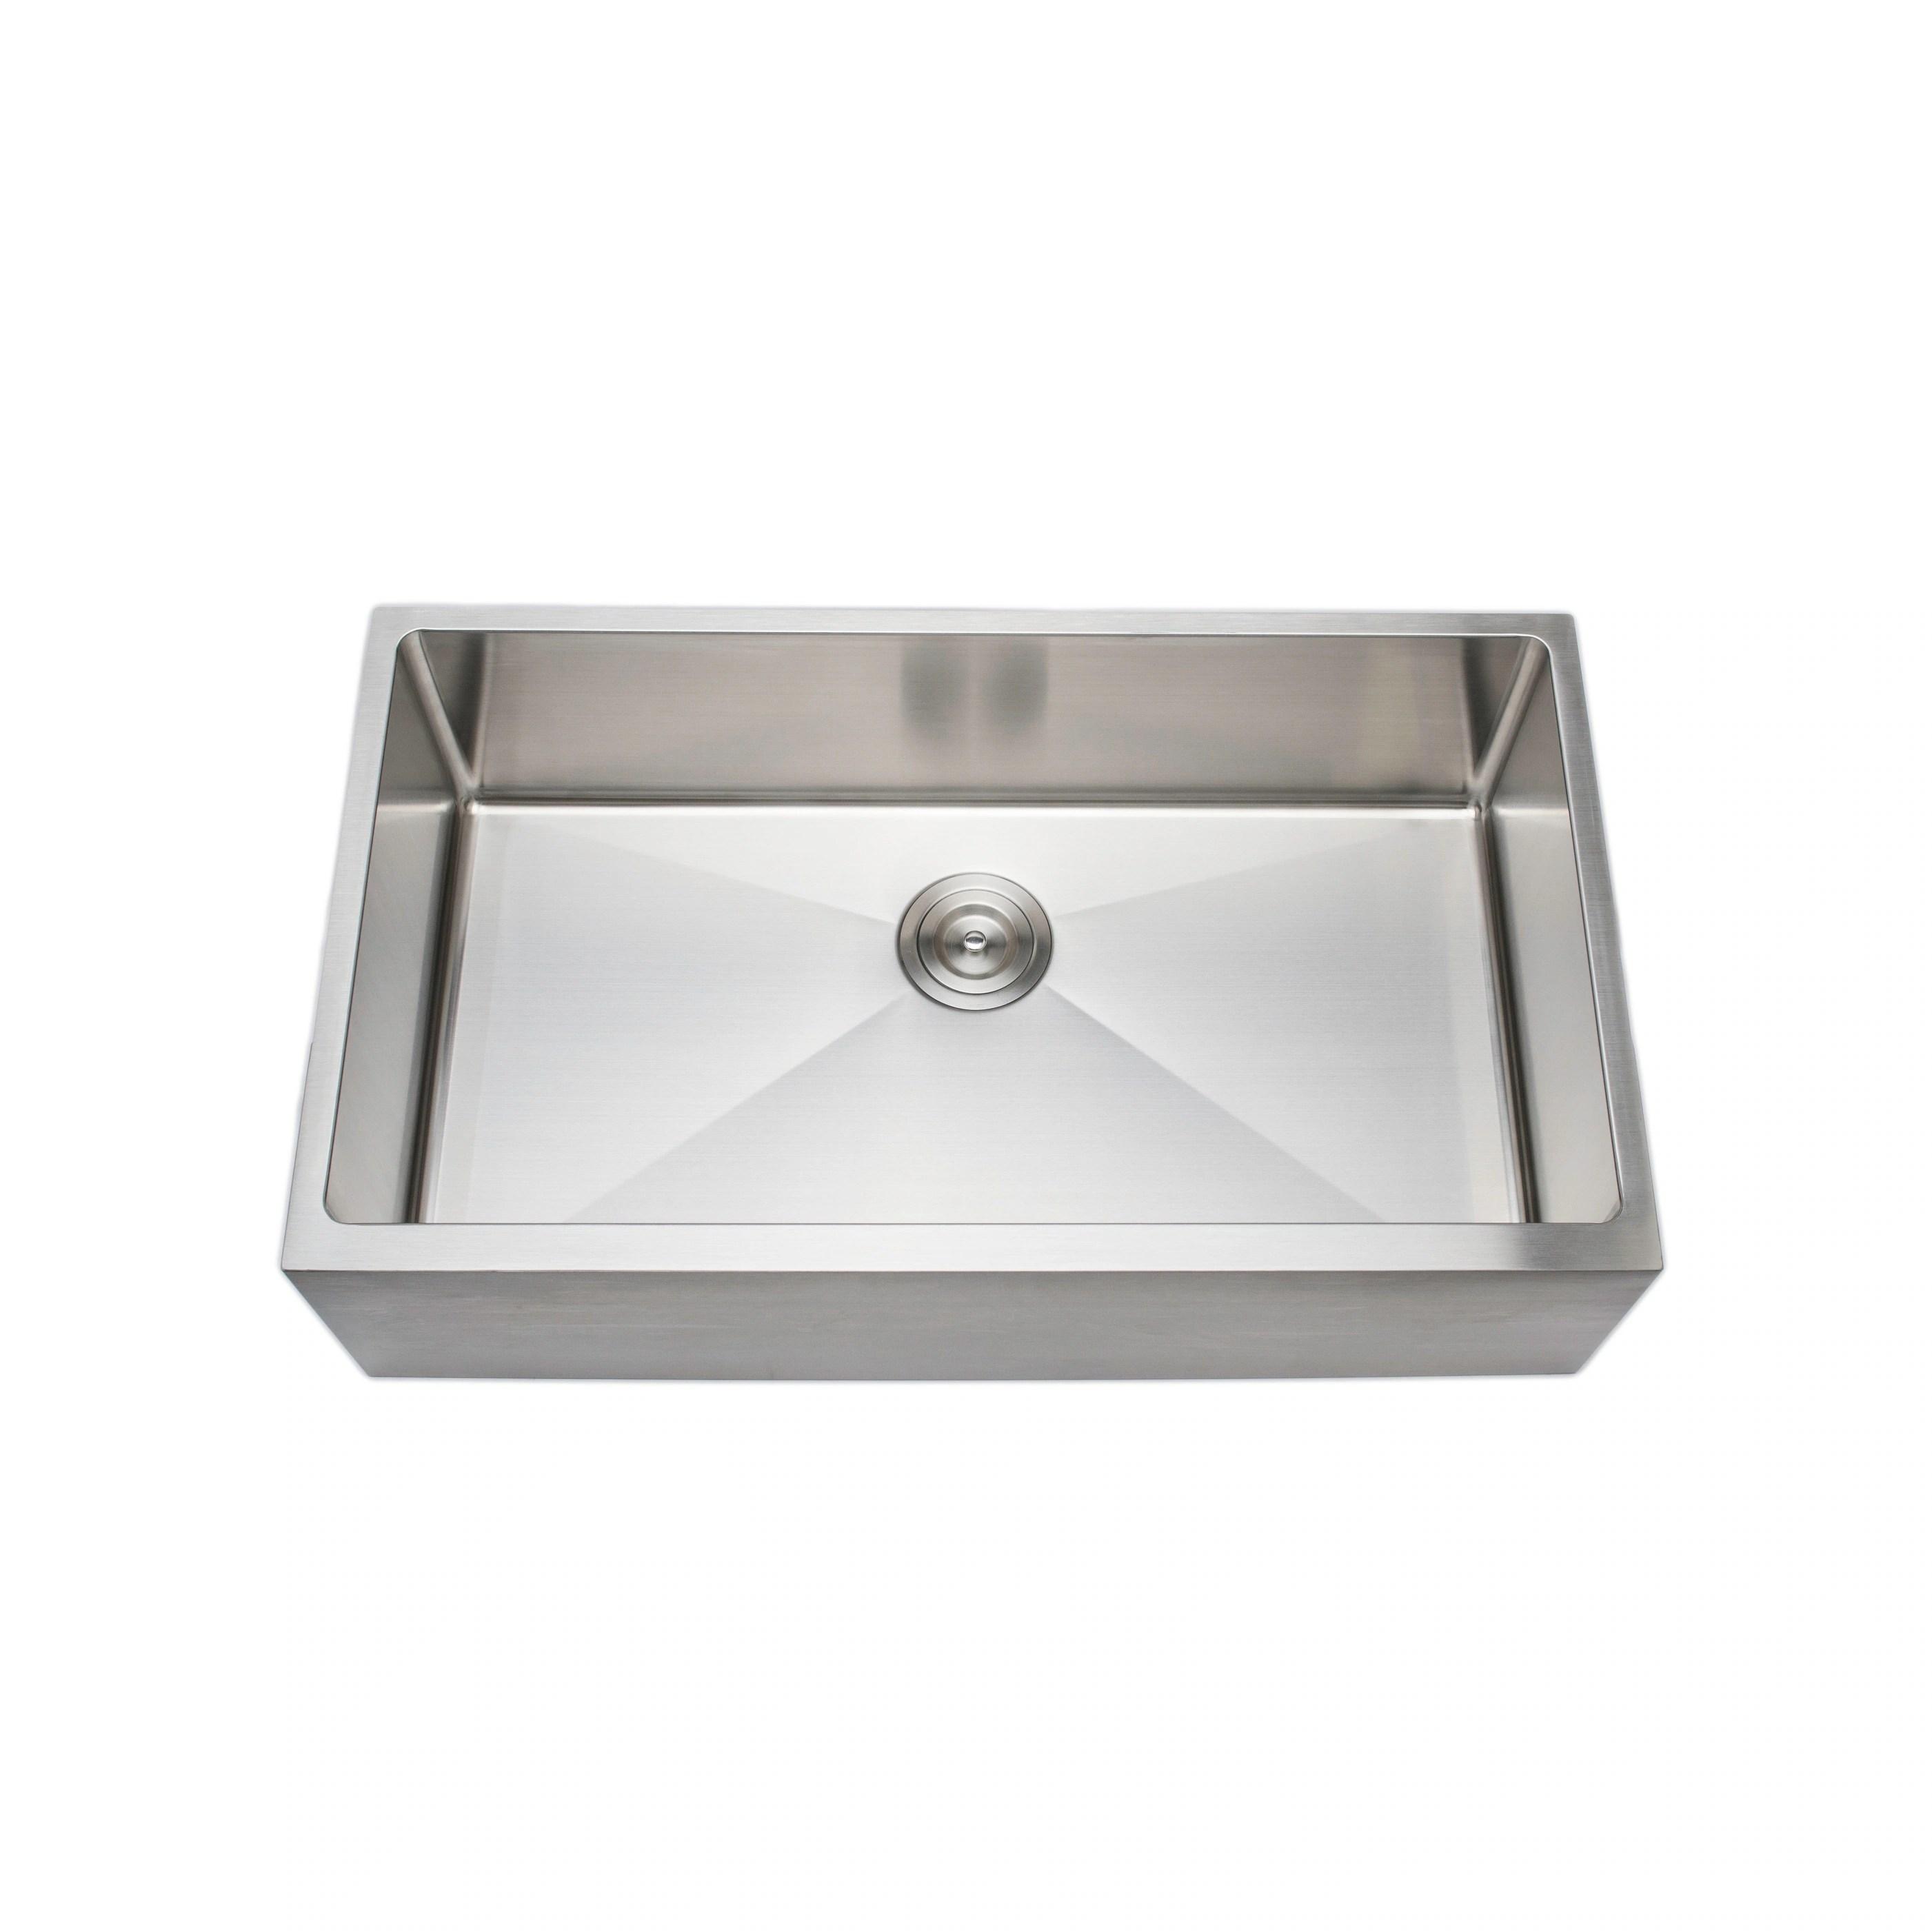 Bathroom Sinks 16 Gauge Undermount Apron Front Farmhouse Stainless Steel Kitchen Sink Stuudio35 Ee